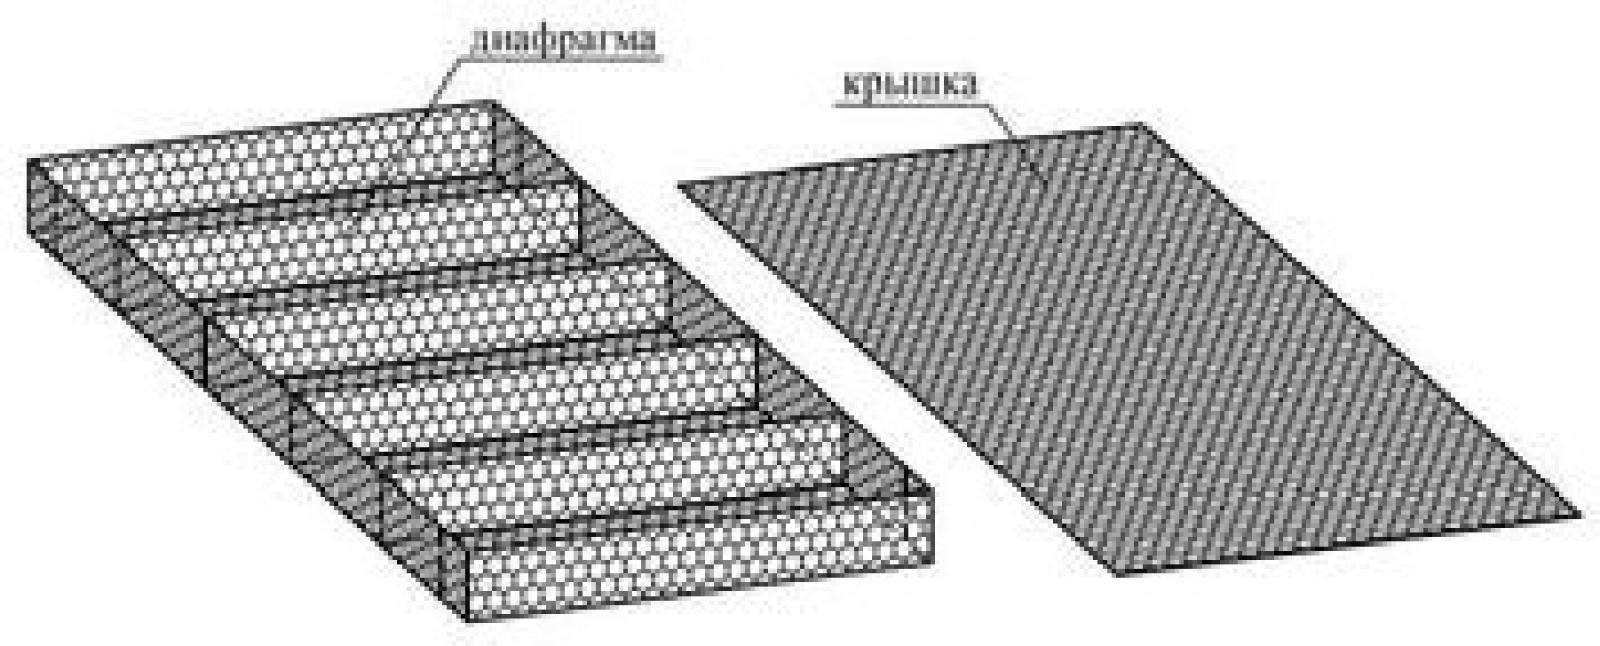 Габион матрацного типаСтандартные размеры: